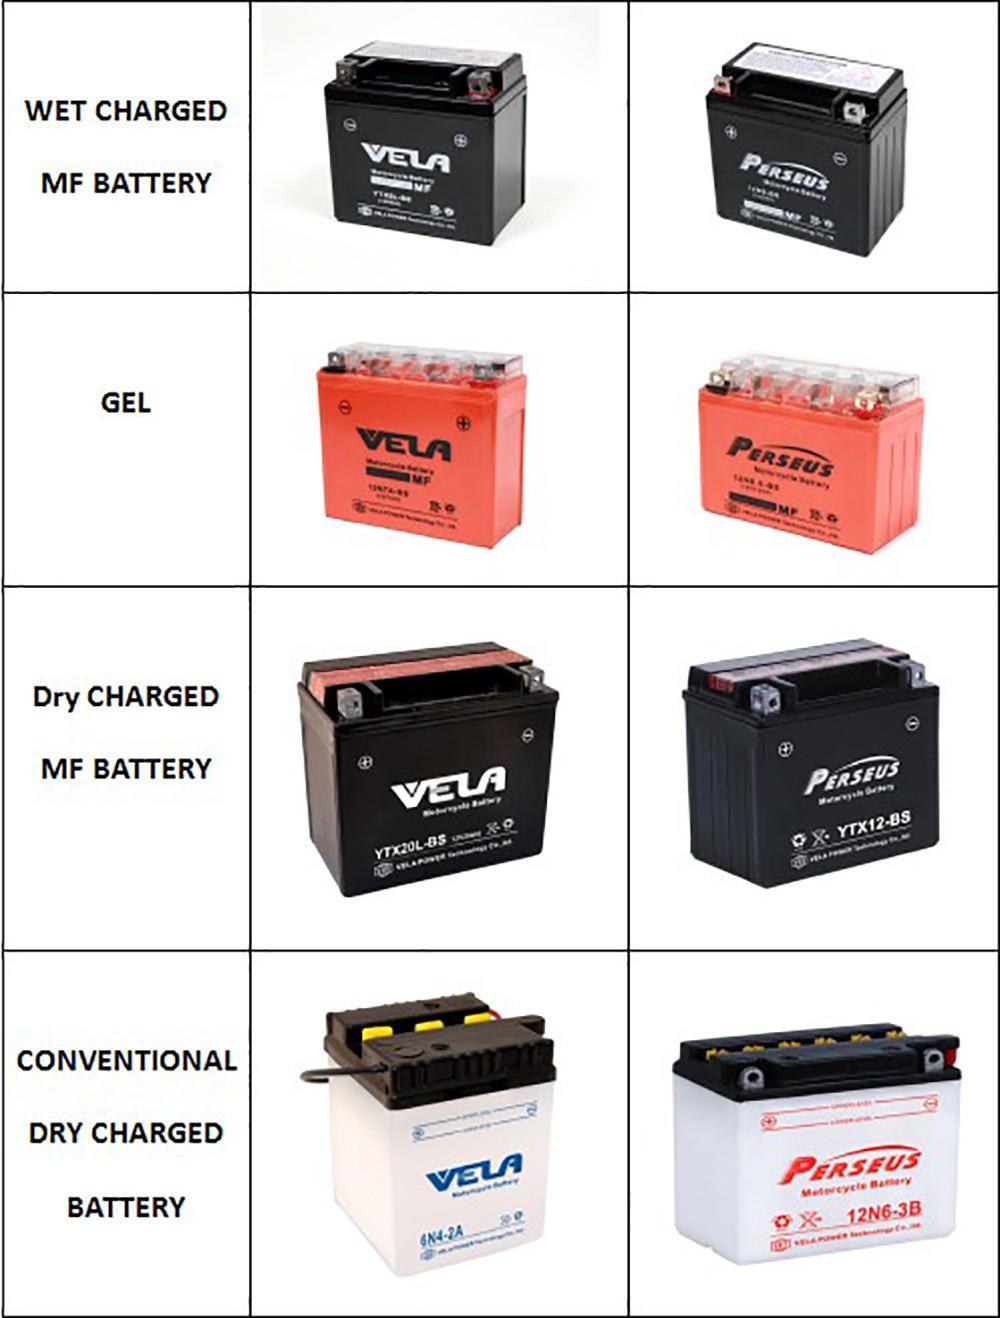 VELA gel motorcycle battery popular for motorcycle industry-2